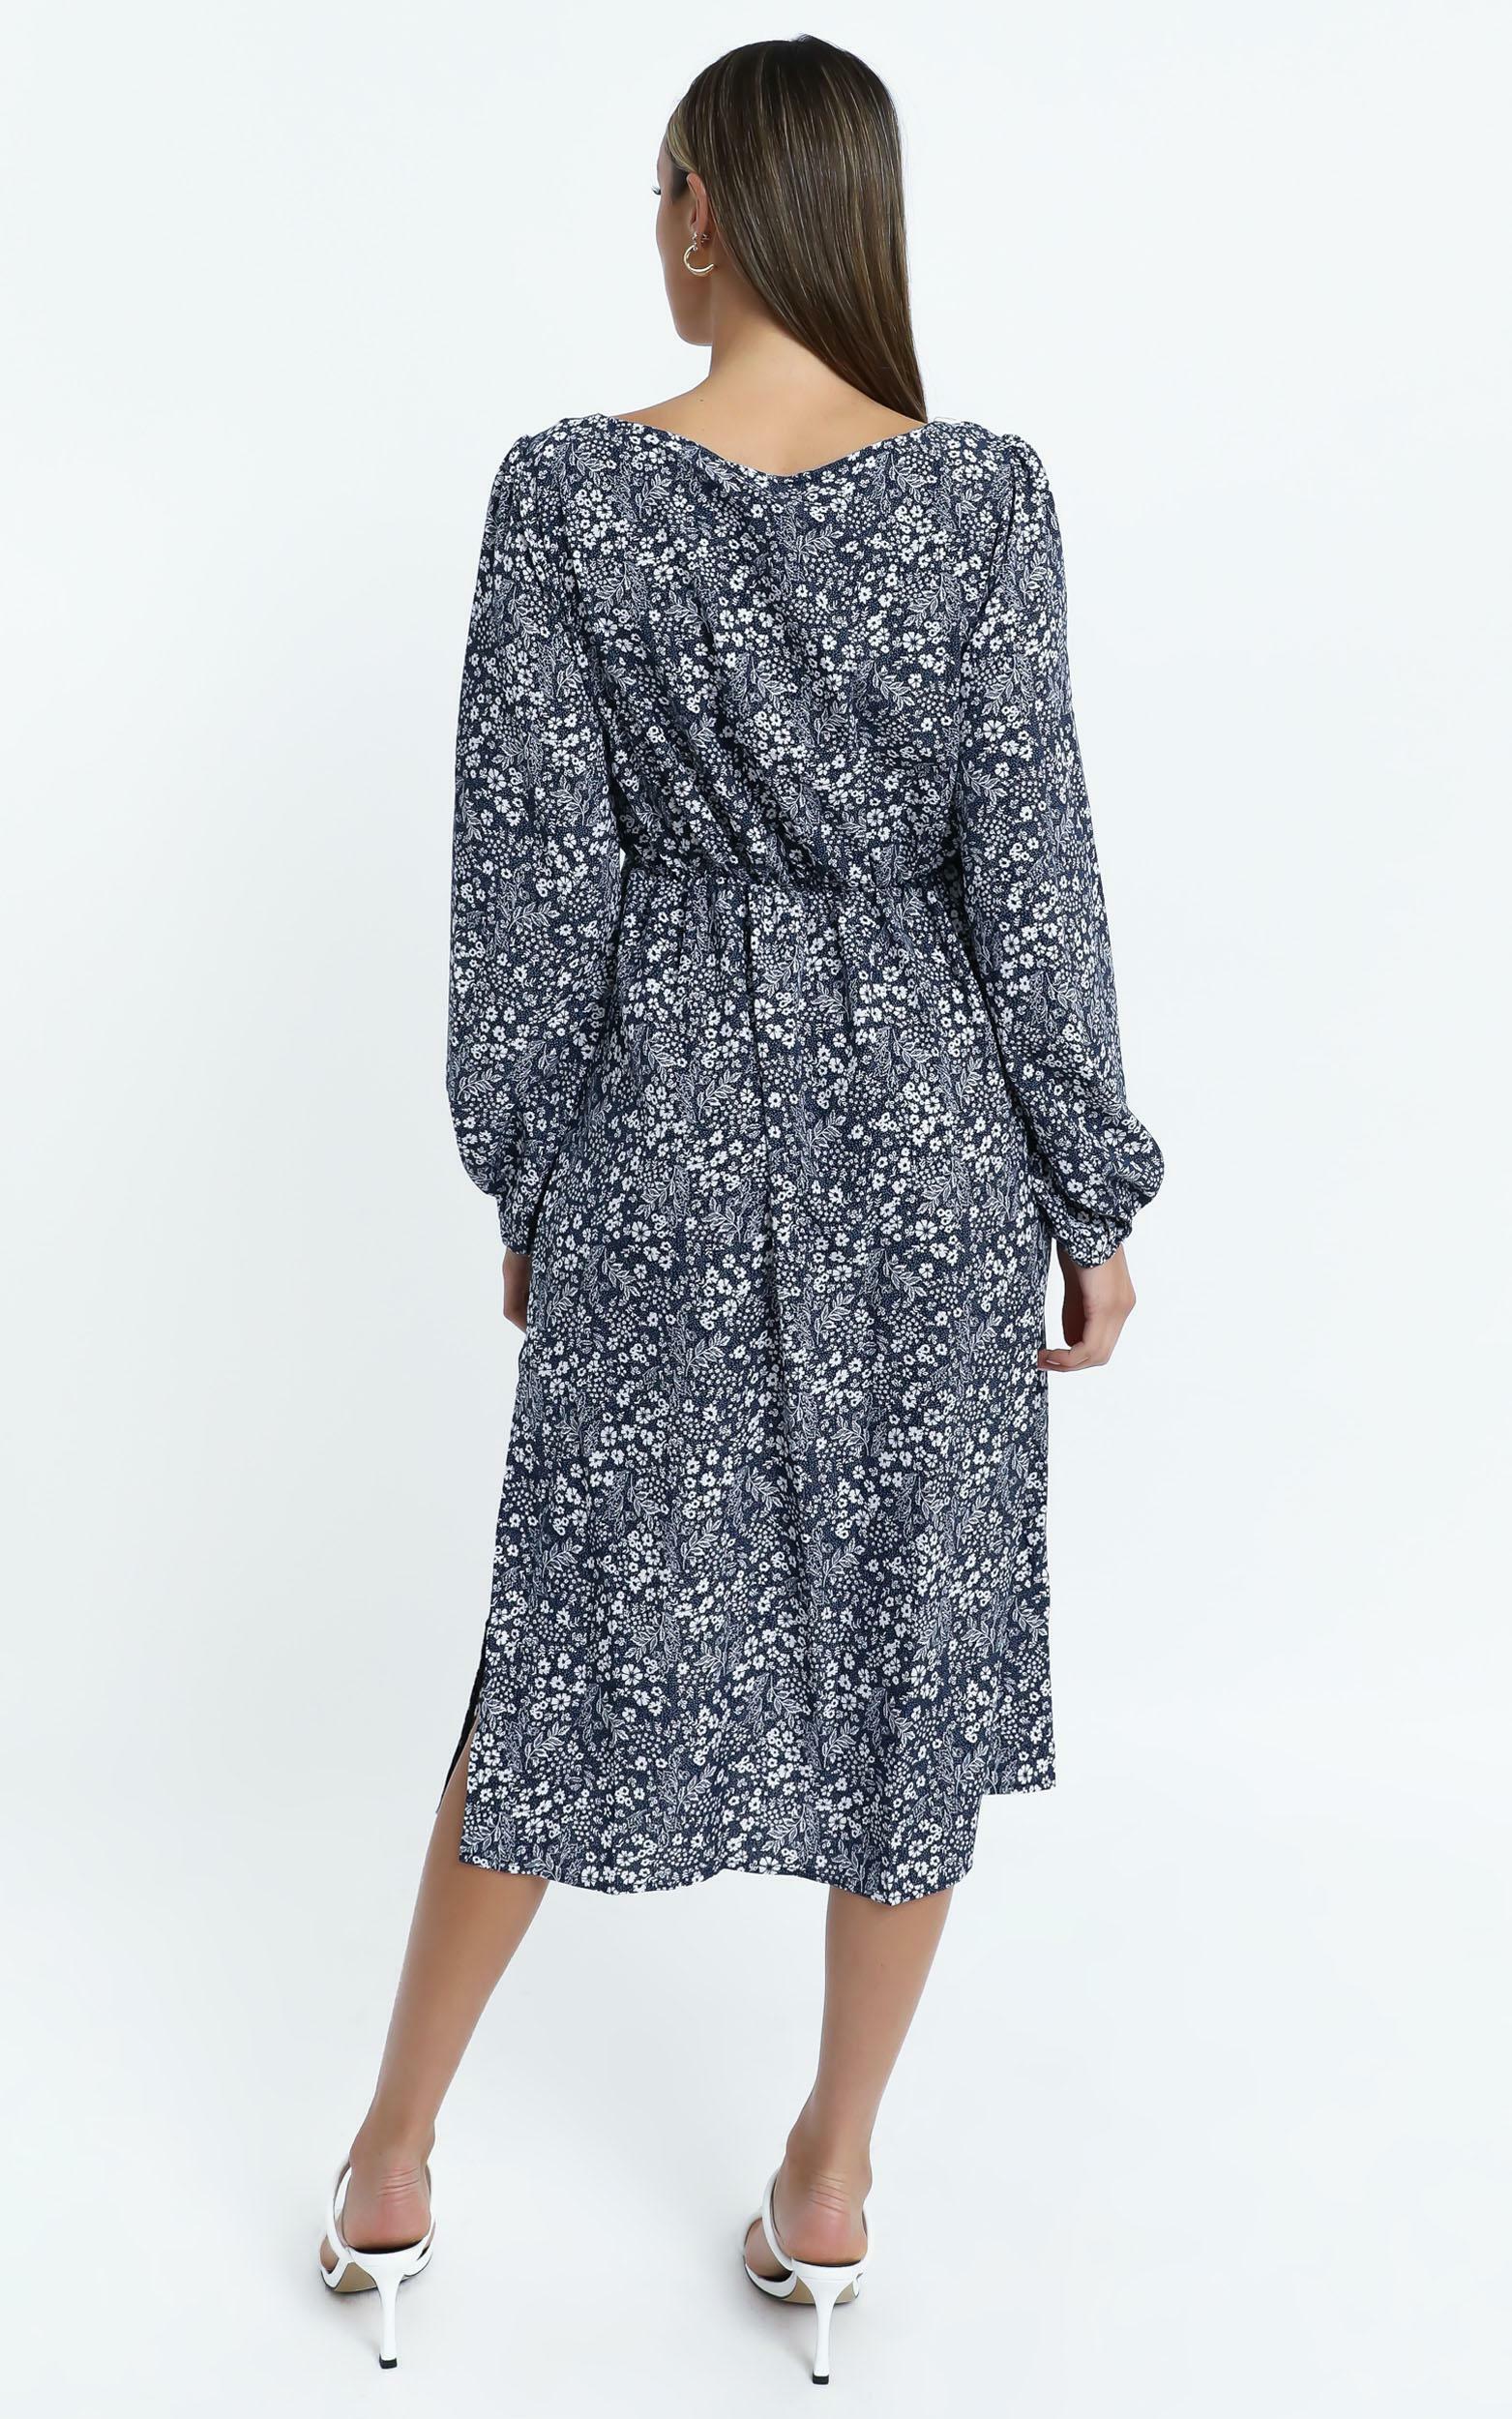 Amare Dress in Navy Floral - 14 (XL), NVY1, hi-res image number null